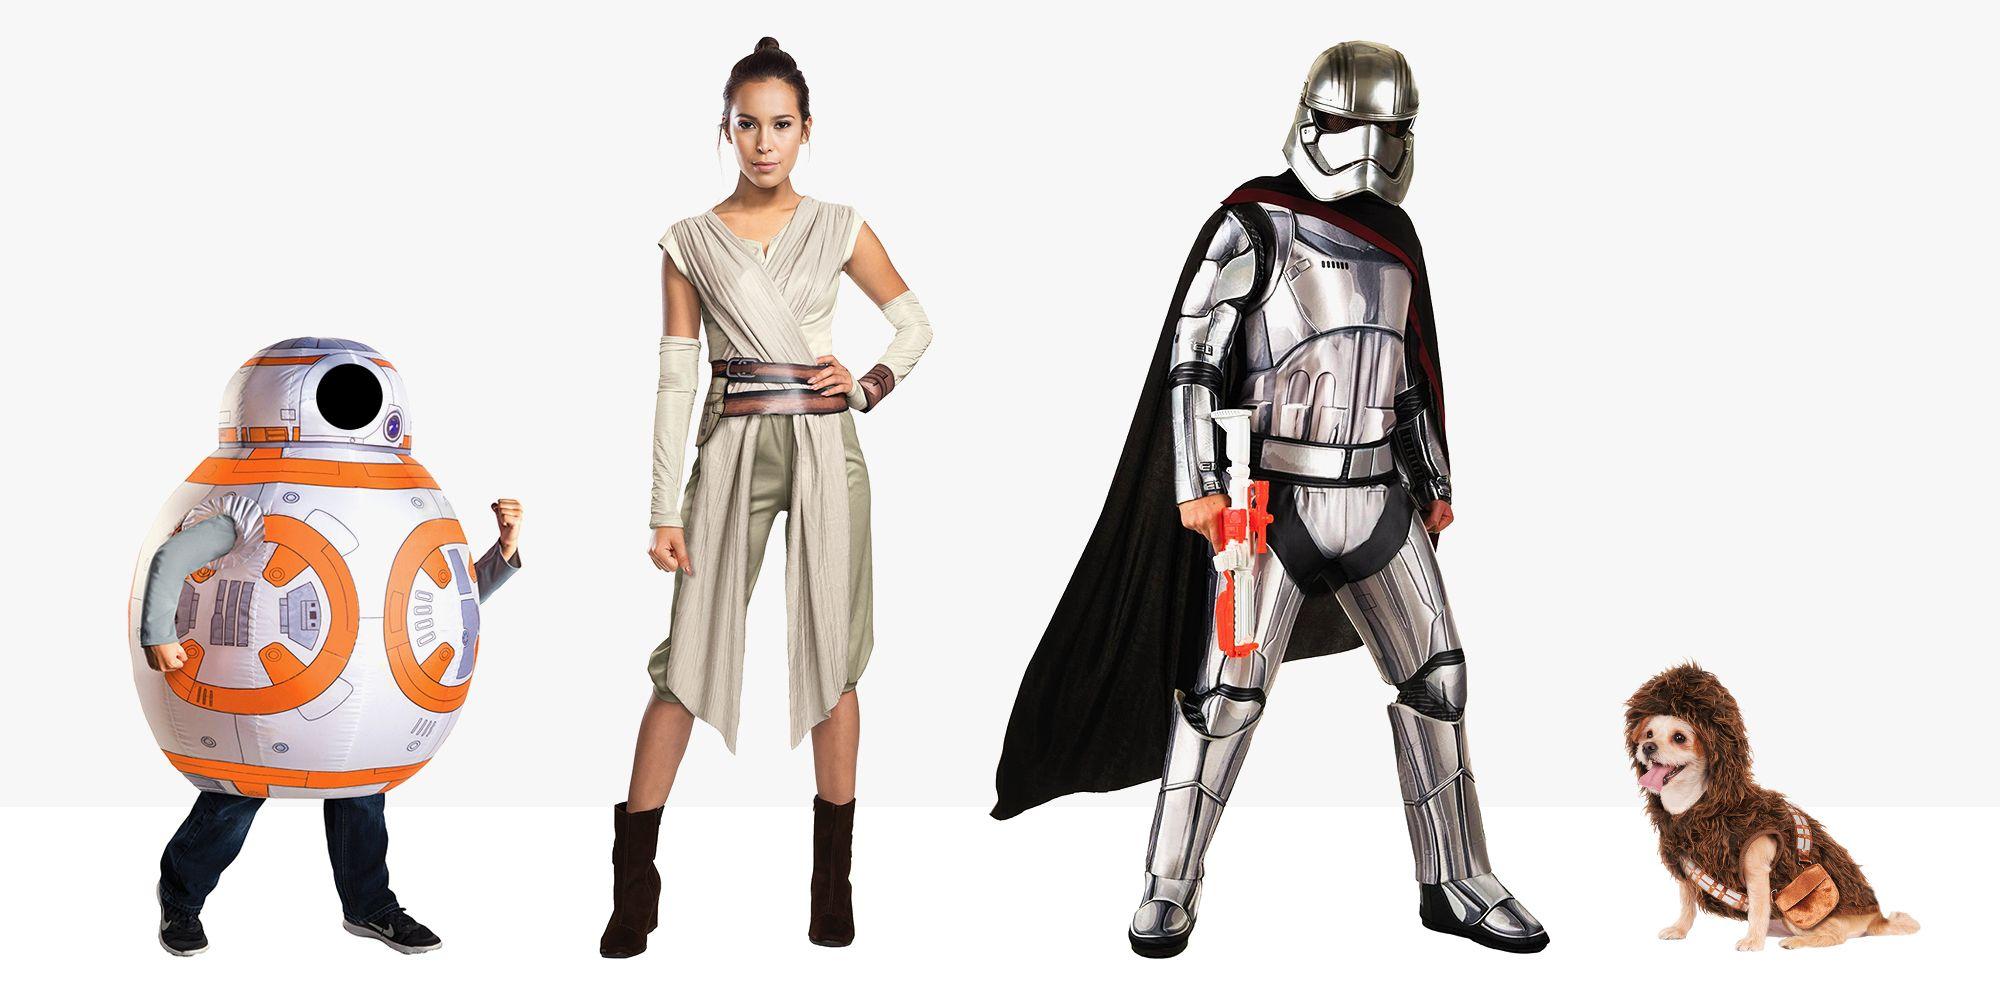 star wars halloween costumes best 2018  sc 1 st  BestProducts.com & 15 Best Star Wars Costumes for Halloween 2018 - Star Wars Costume ...